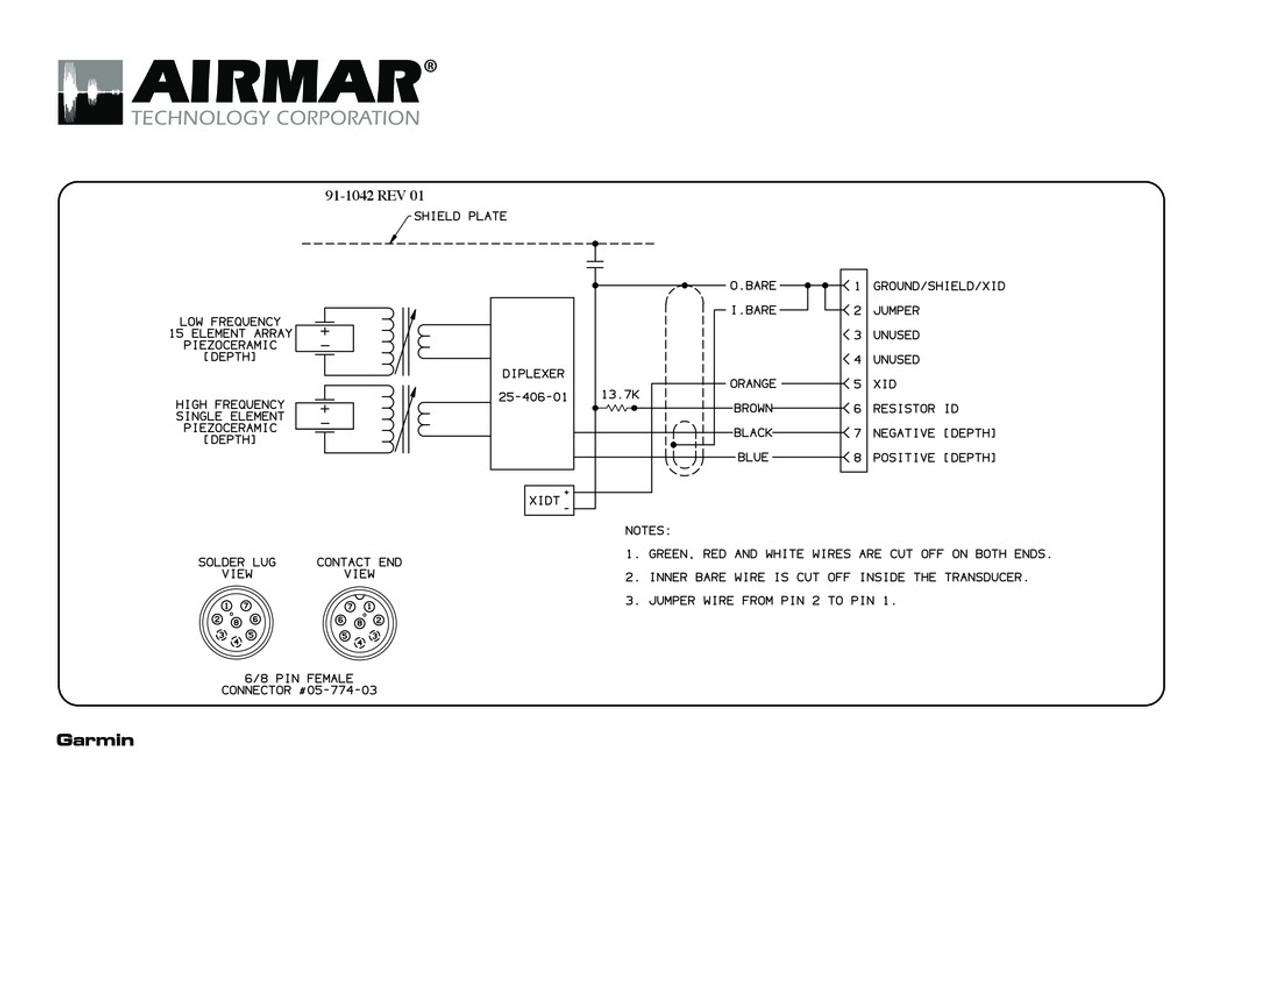 airmar wiring diagram garmin r199 8 pin d t blue bottle marinedepth only [ 1280 x 989 Pixel ]